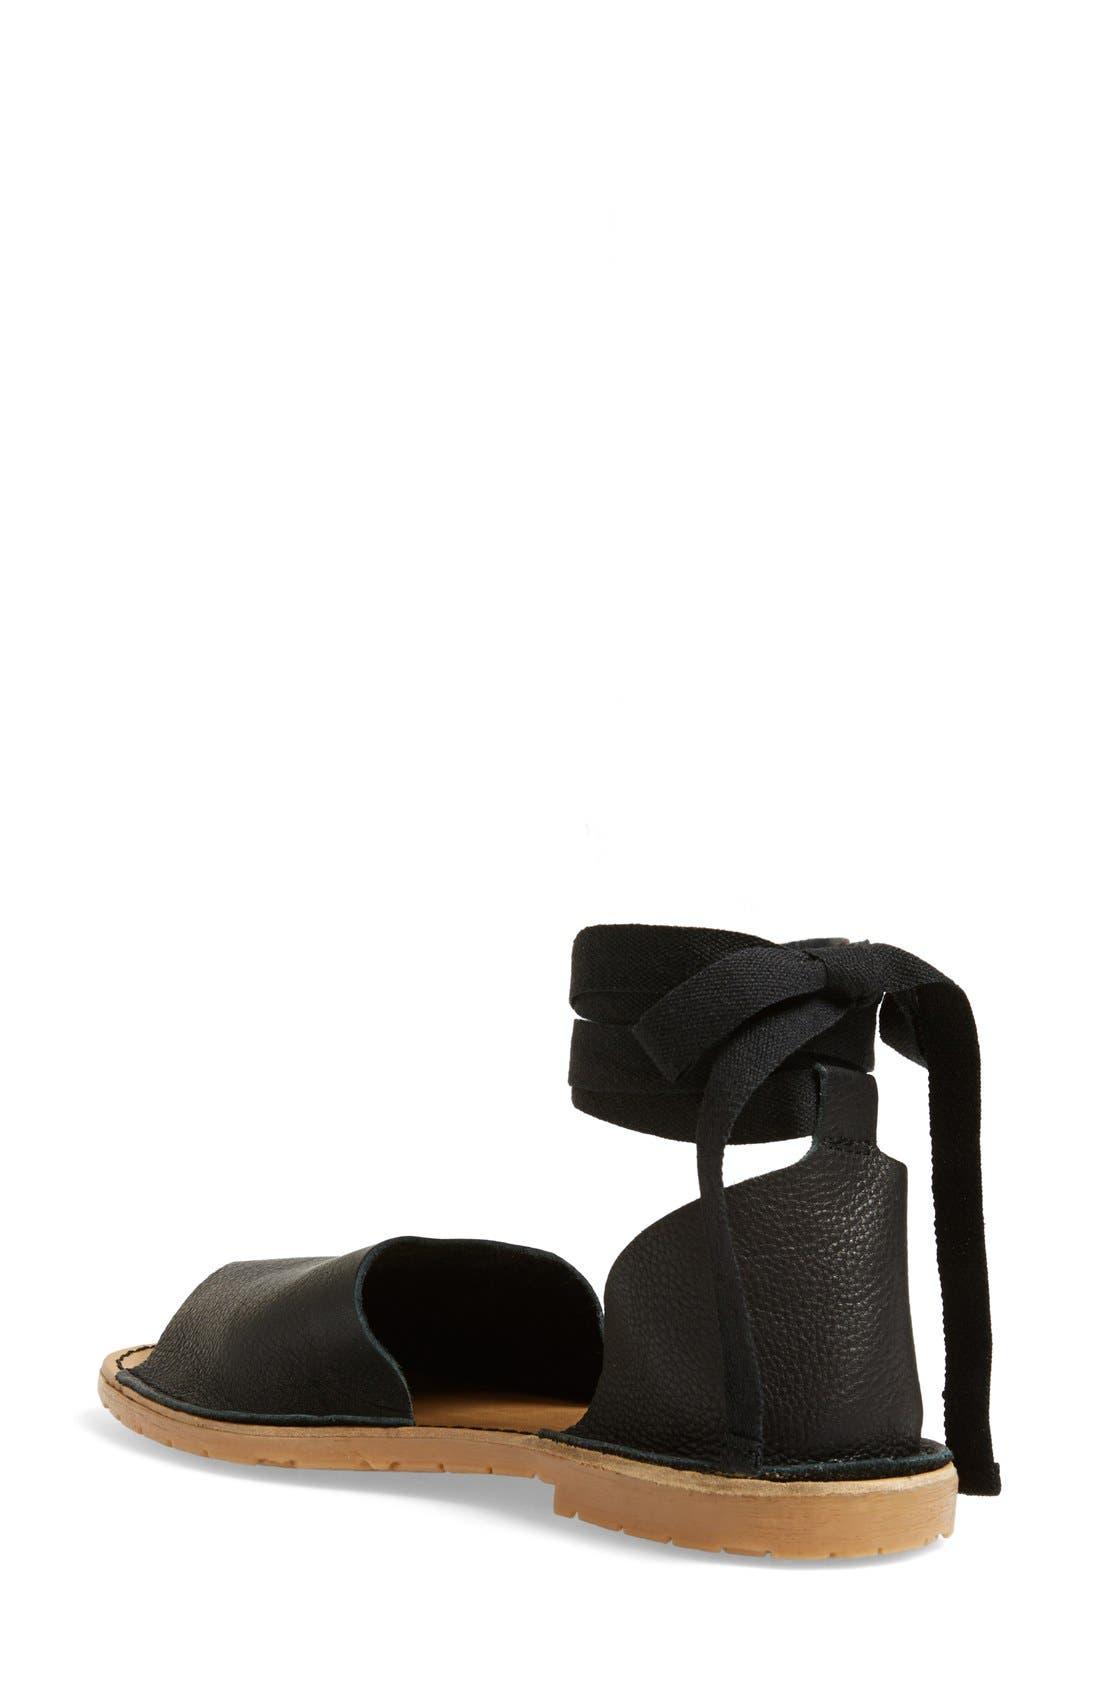 Alternate Image 2  - Topshop 'Feline' Wraparound Ankle Strap Sandal (Women)